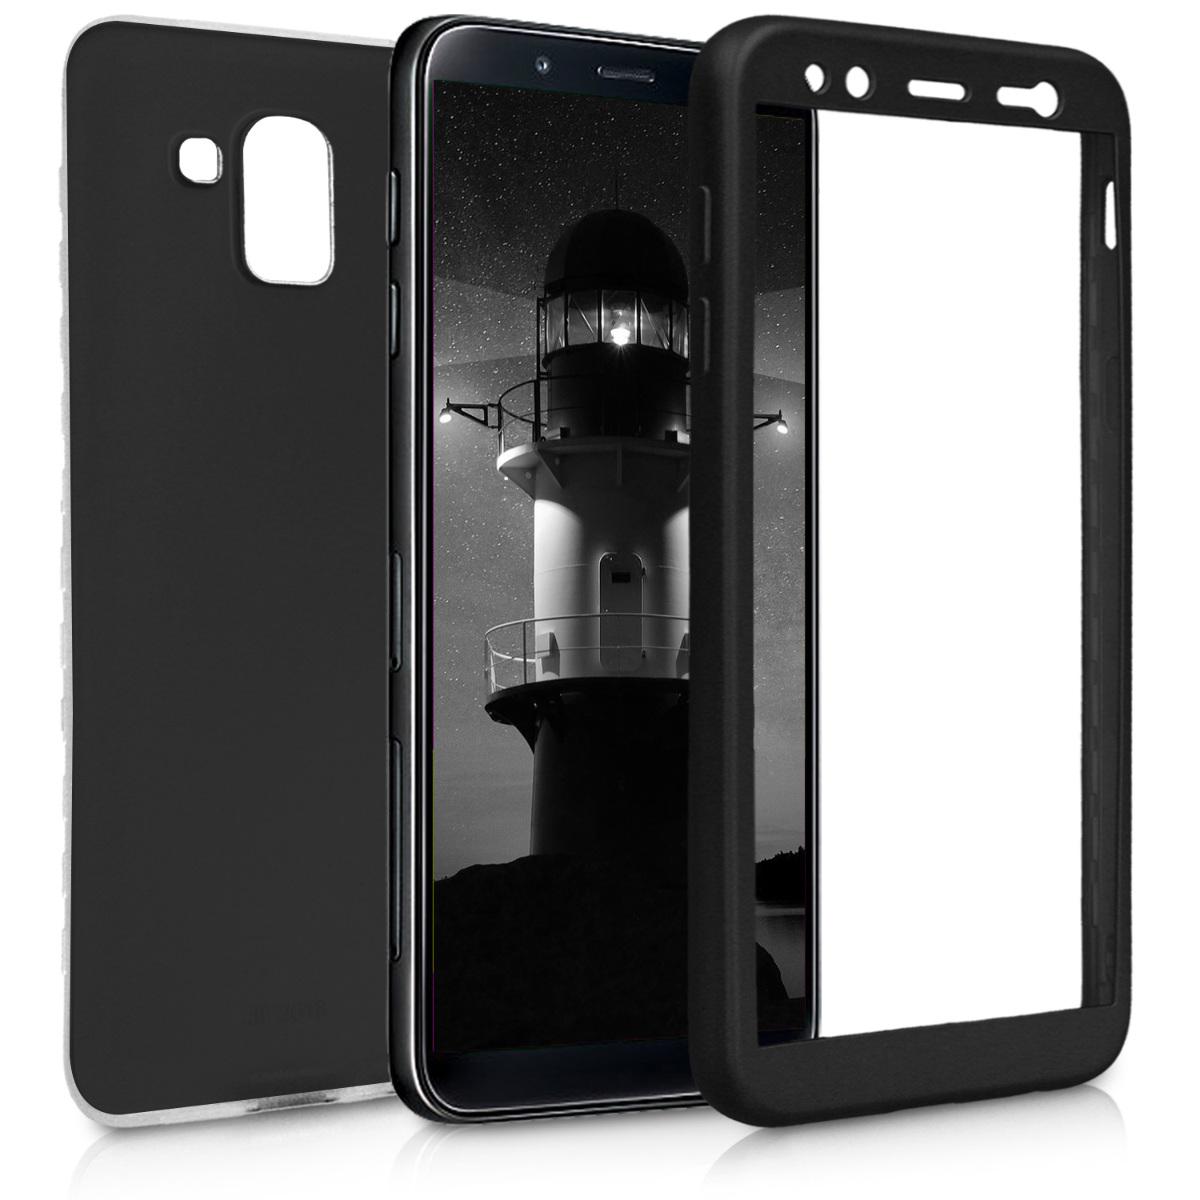 KW Θήκη Σιλικόνης Full Body Samsung Galaxy J6 2018 - Μαύρο μεταλλικό (45806.68)